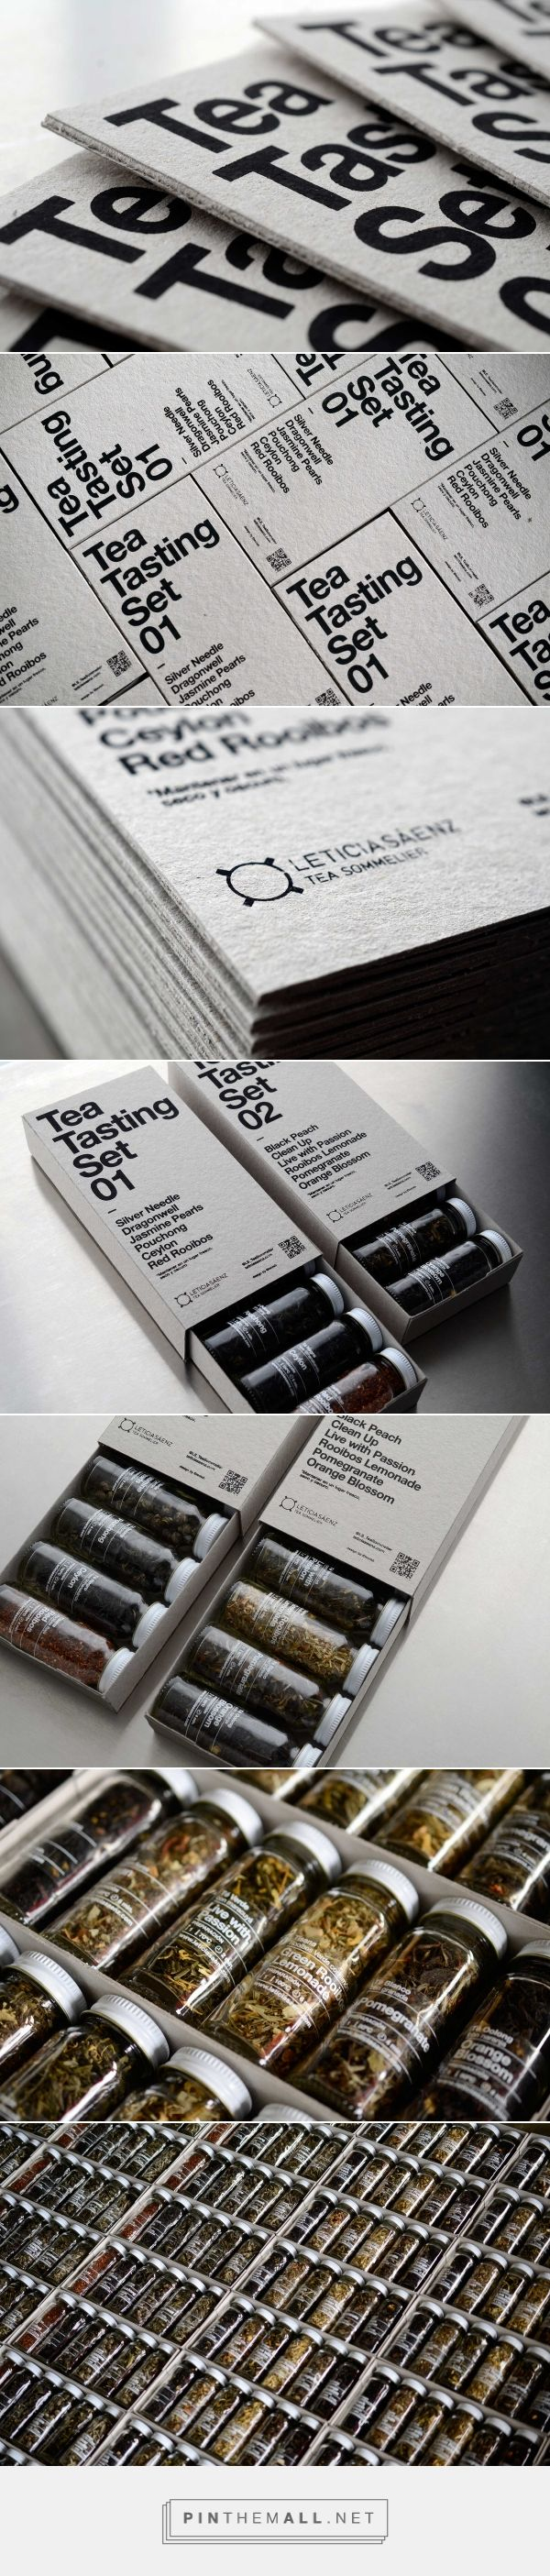 Tea Tasting Sets V1 - - created via http://pinthemall.net